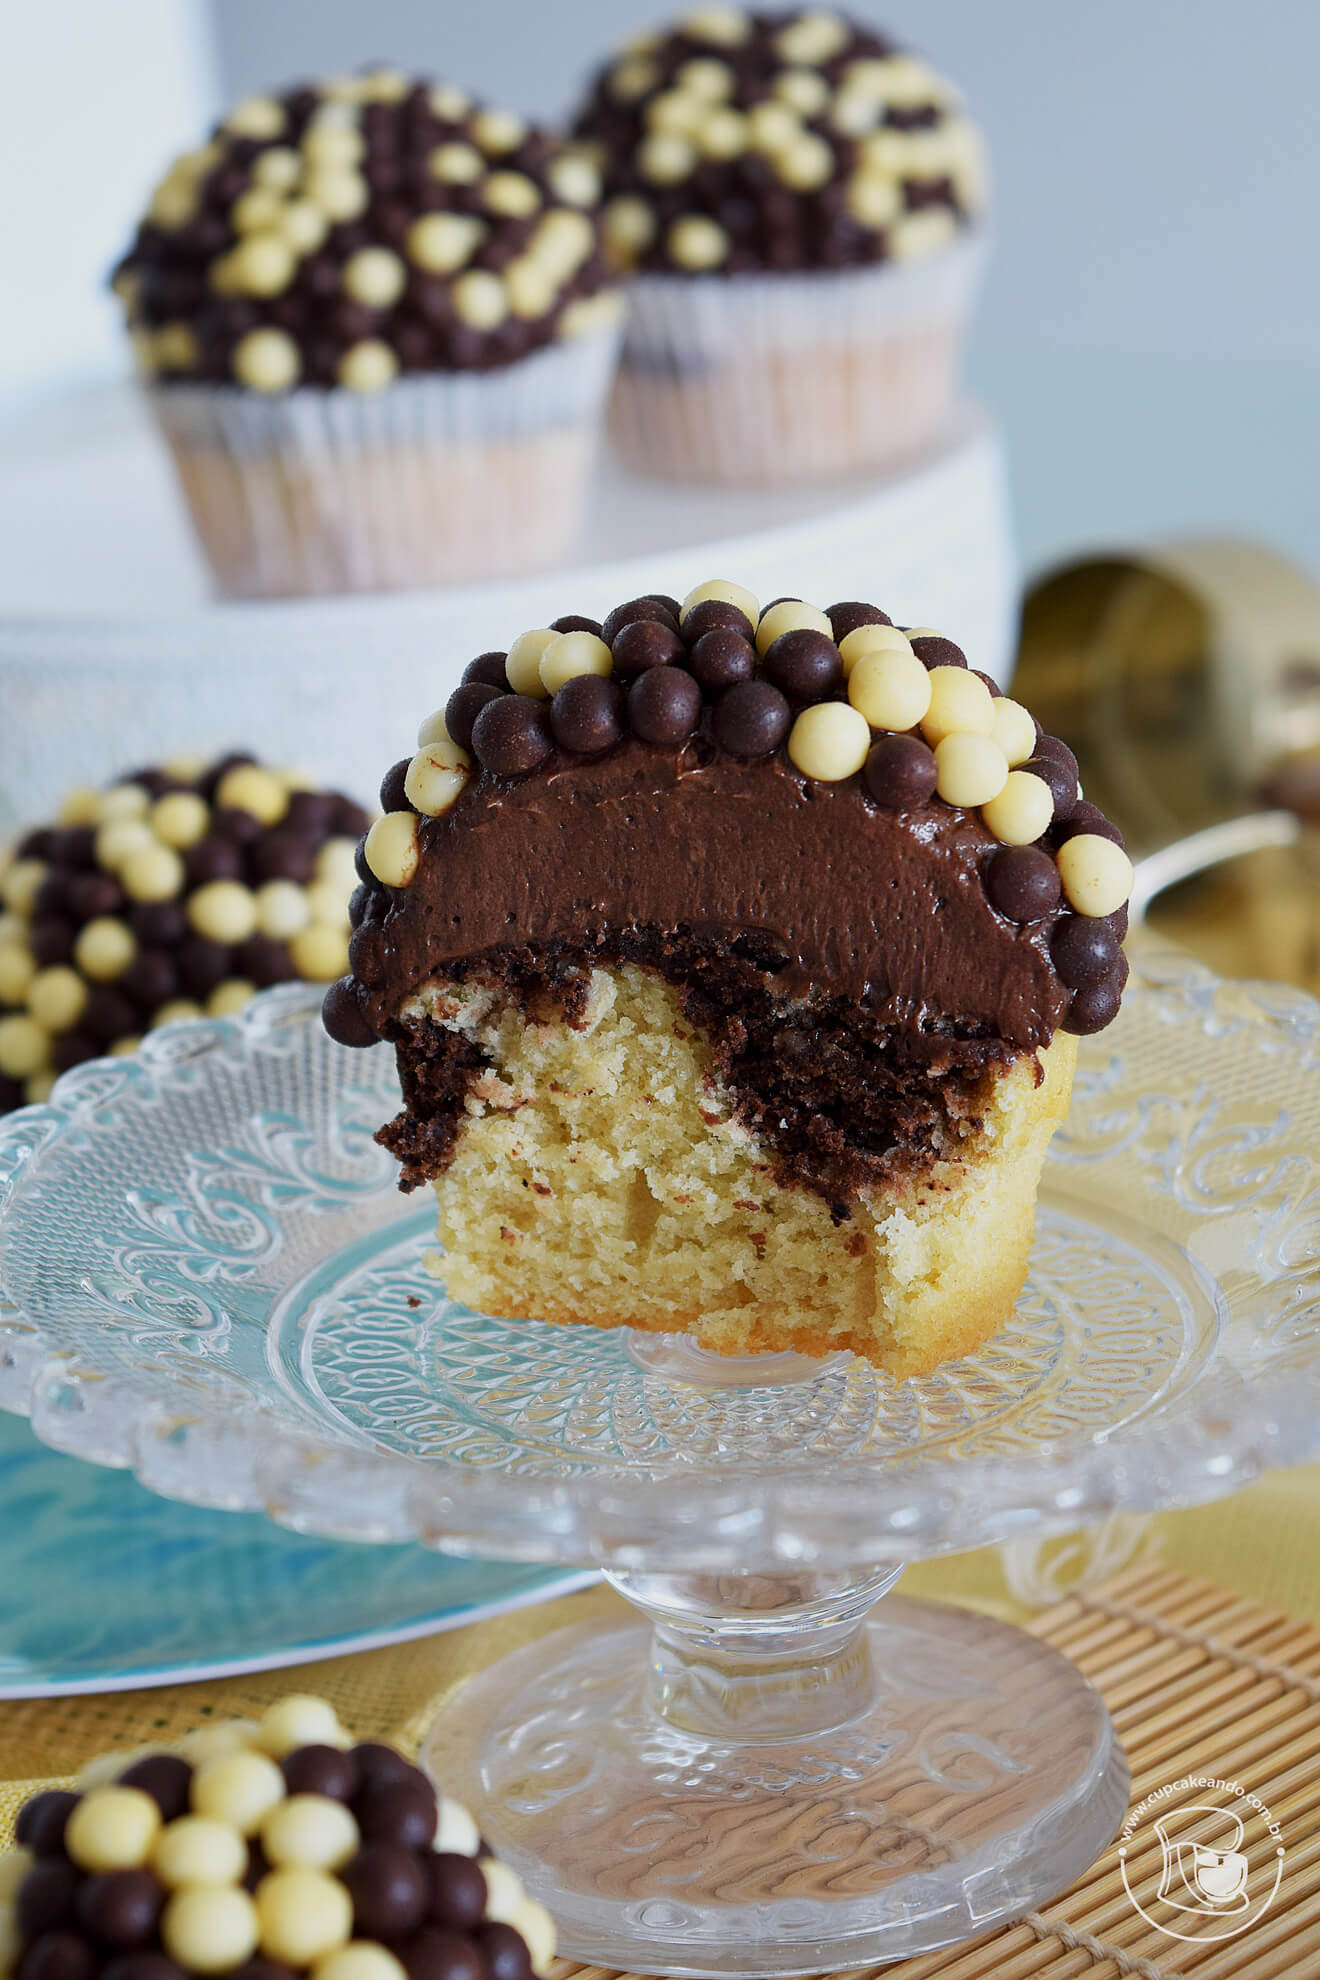 Cupcakes mesclados com cobertura de creamcheese de cacau